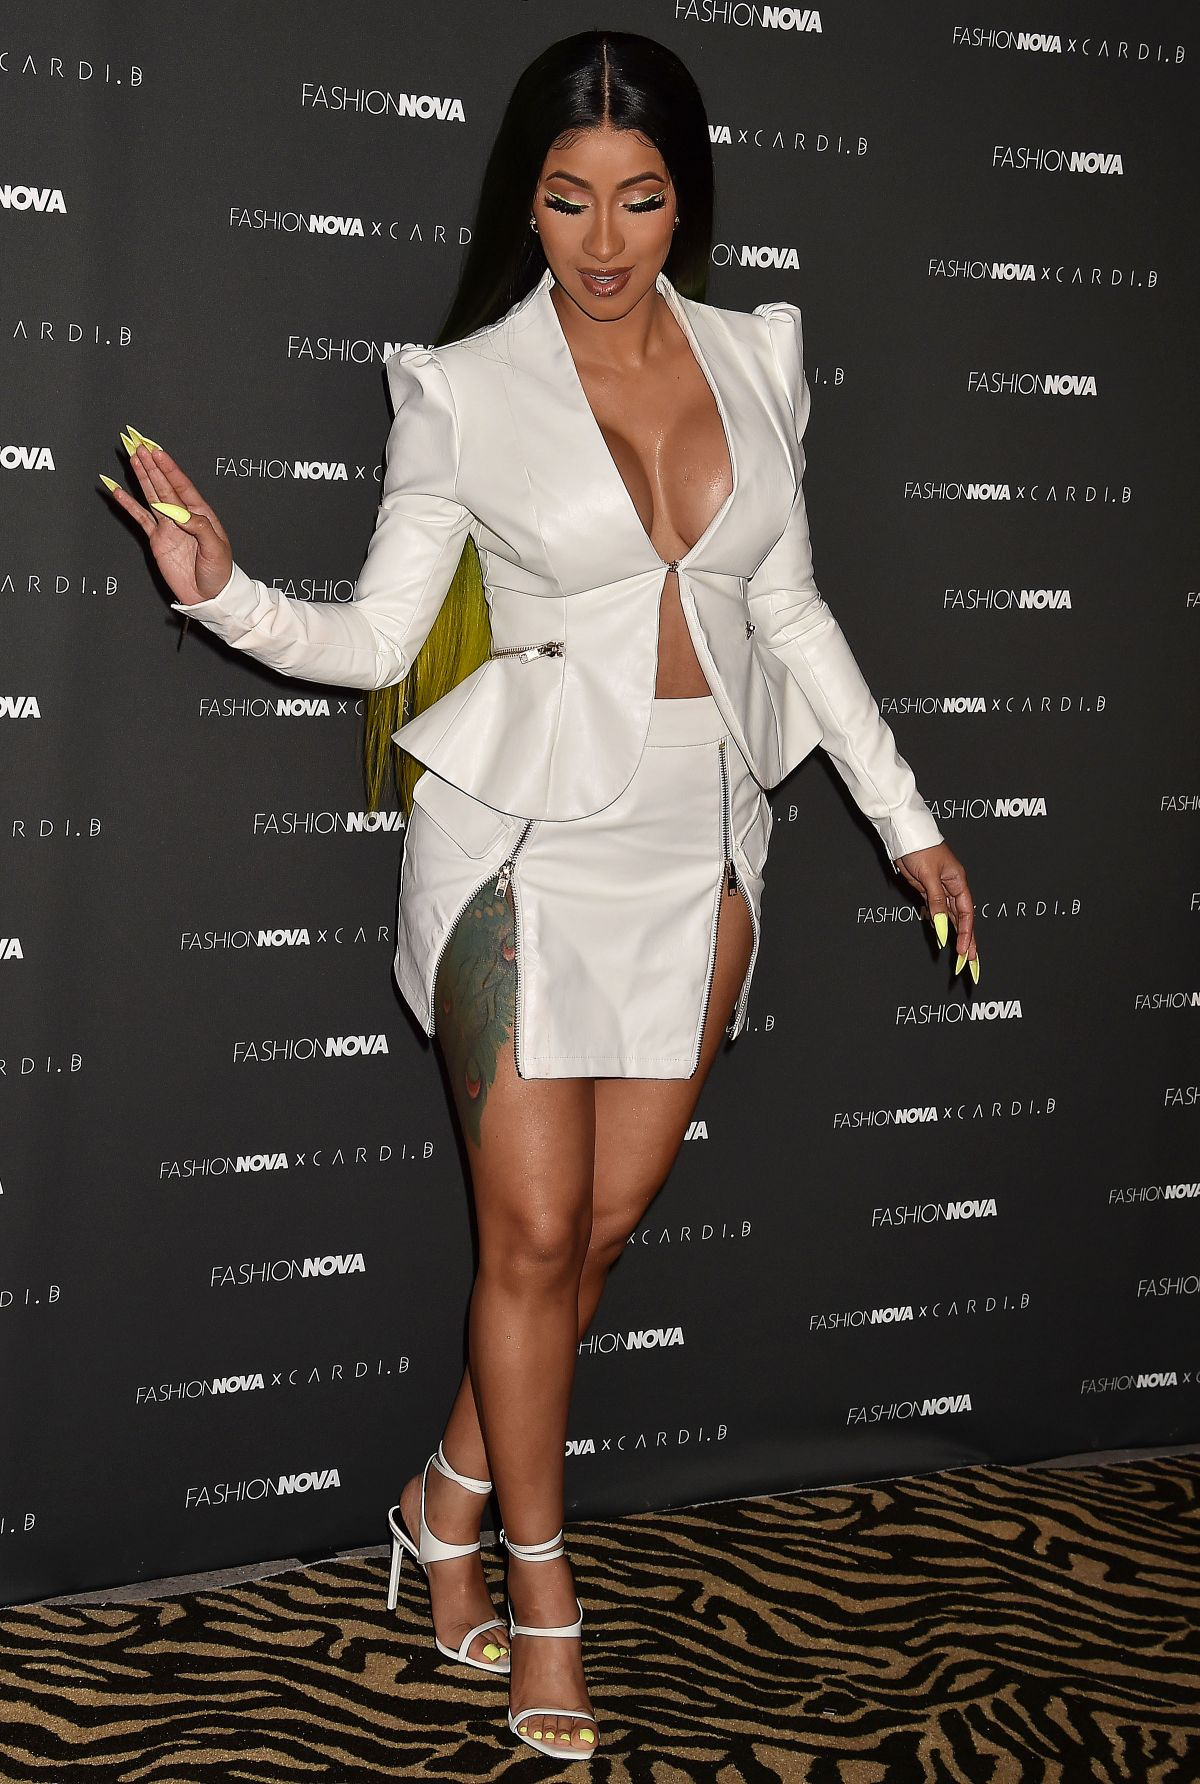 Cardi B No Clothing: CARDI B At Fashion Nova X Cardi B Collection Launch At